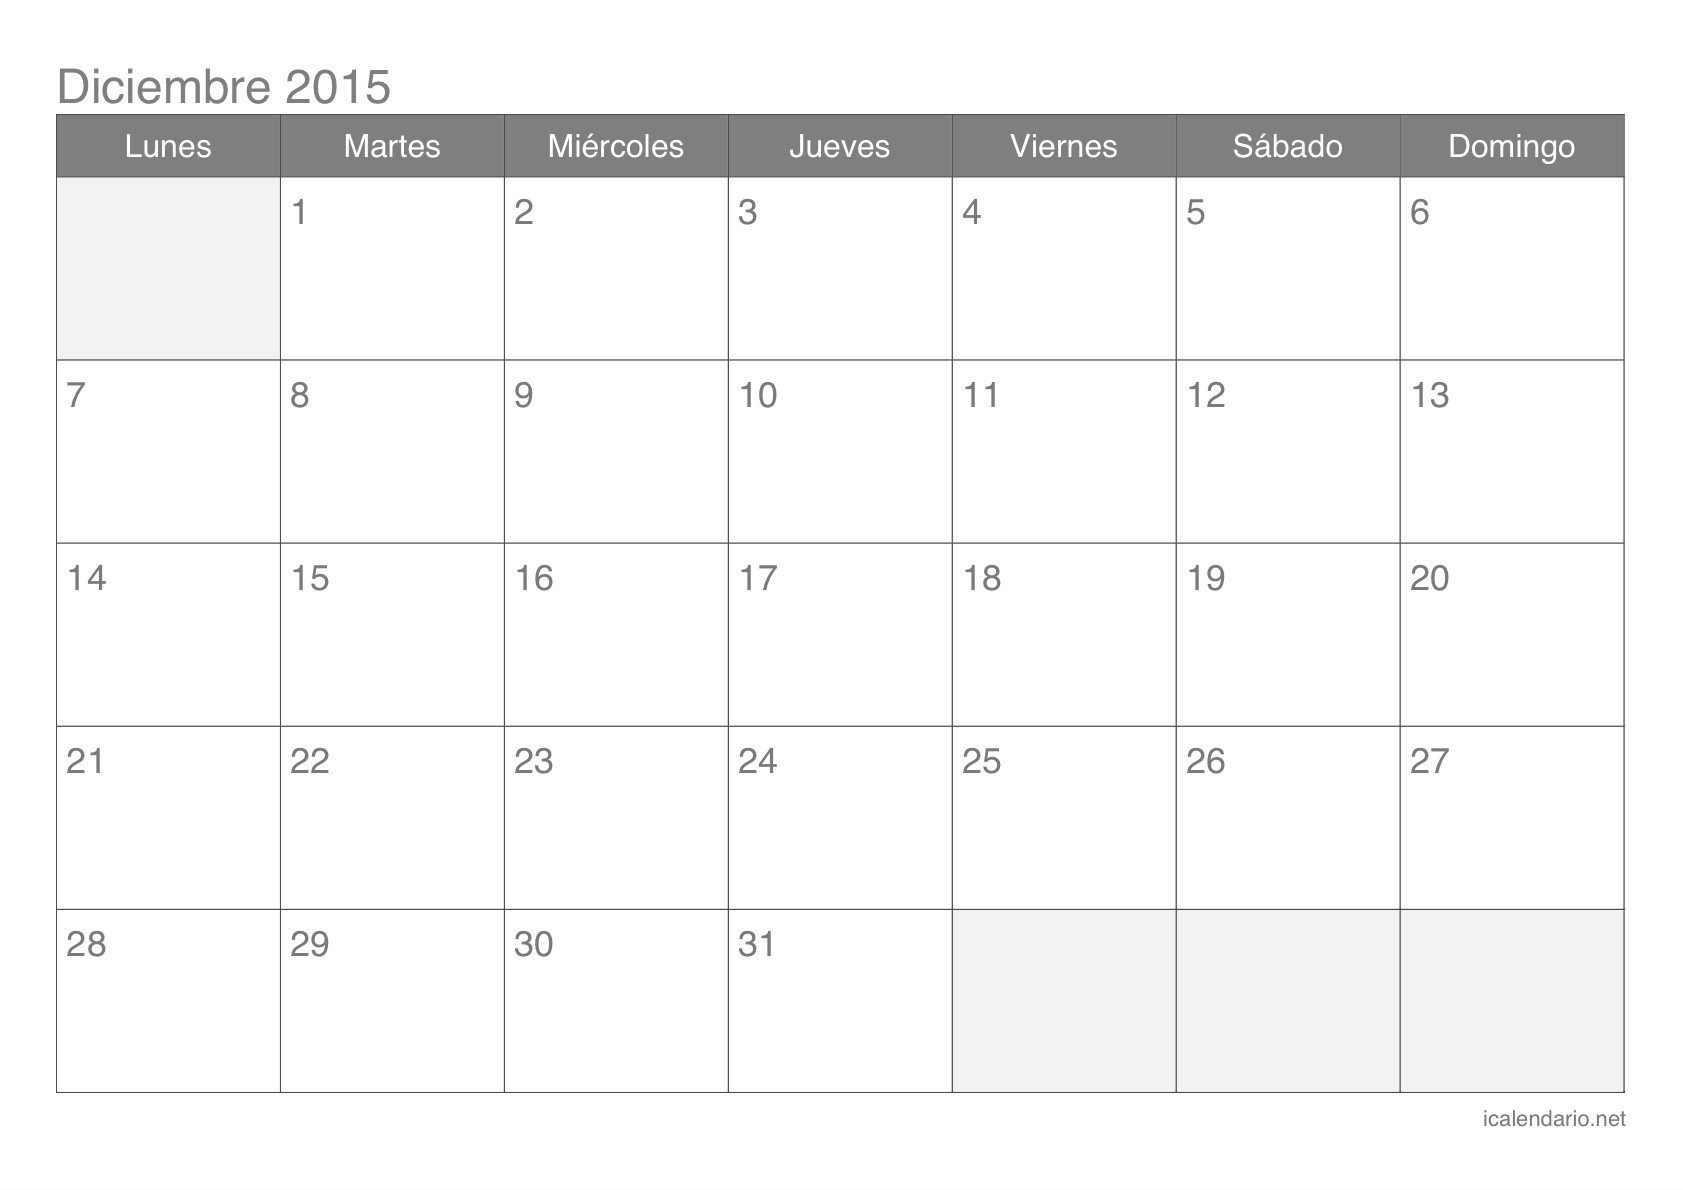 Calendario 2017 Imprimir España Más Arriba-a-fecha Best Calendario Mes De Diciembre 2016 Para Imprimir Image Collection Of Calendario 2017 Imprimir España Más Recientes 254 Best Printables Images by Natalie On Pinterest